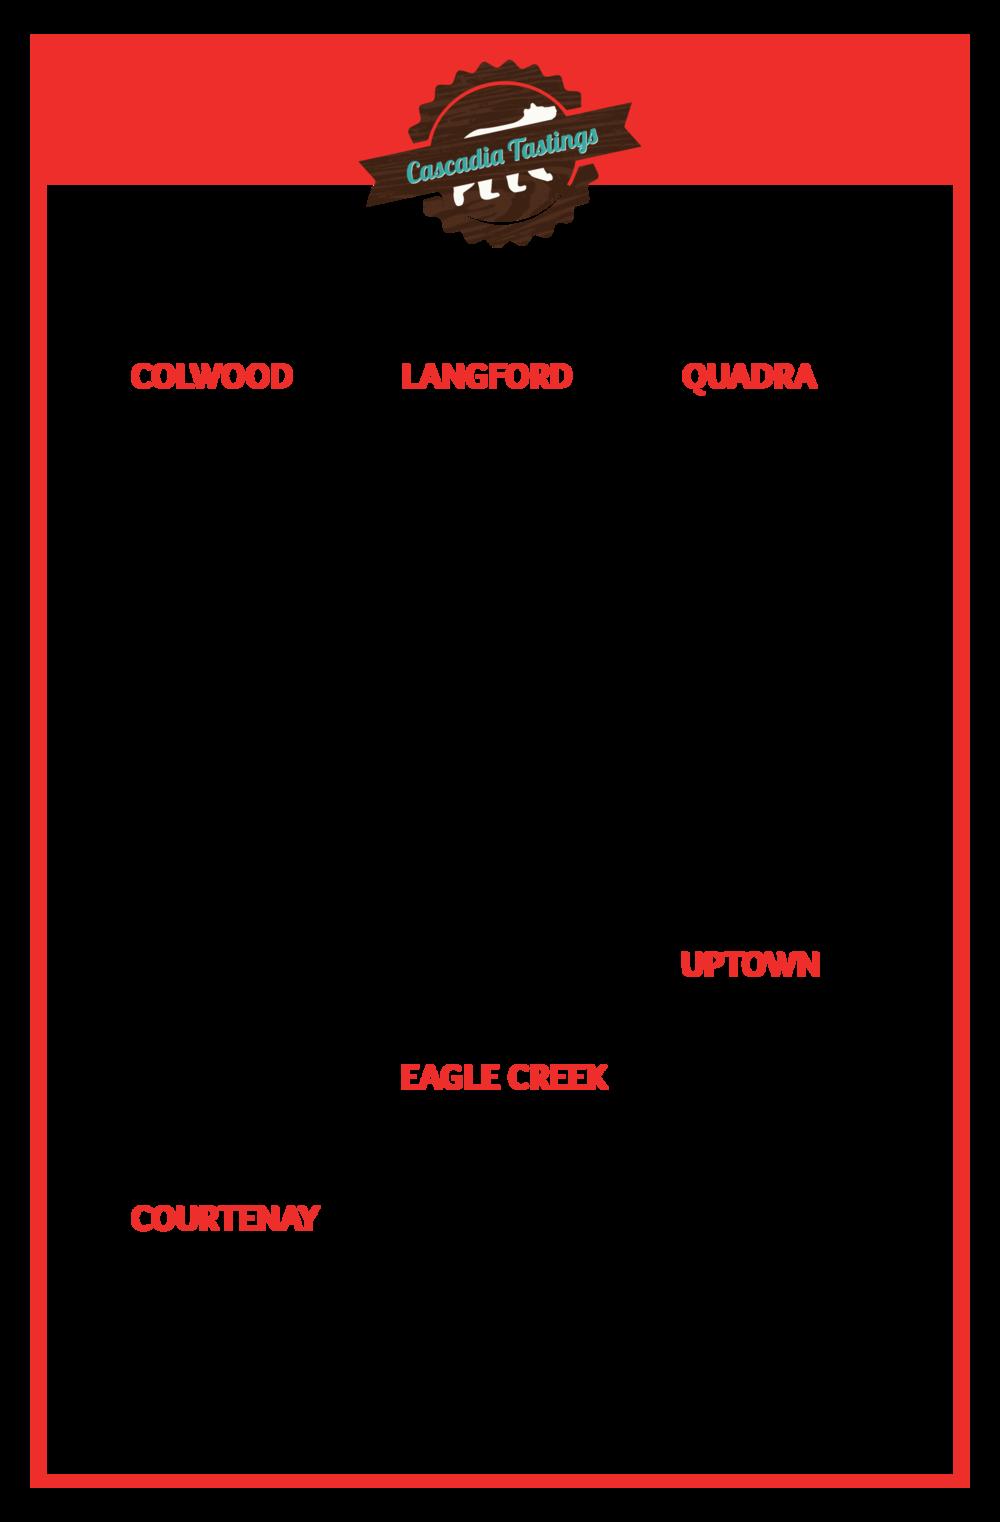 cascadia liquor, tastings, free tastings, wine, beer, liquor store, victoria bc, victoria liquor stores, colwood, westshore, comox, comox valley, uptown, eagle creek, langford, quadra village